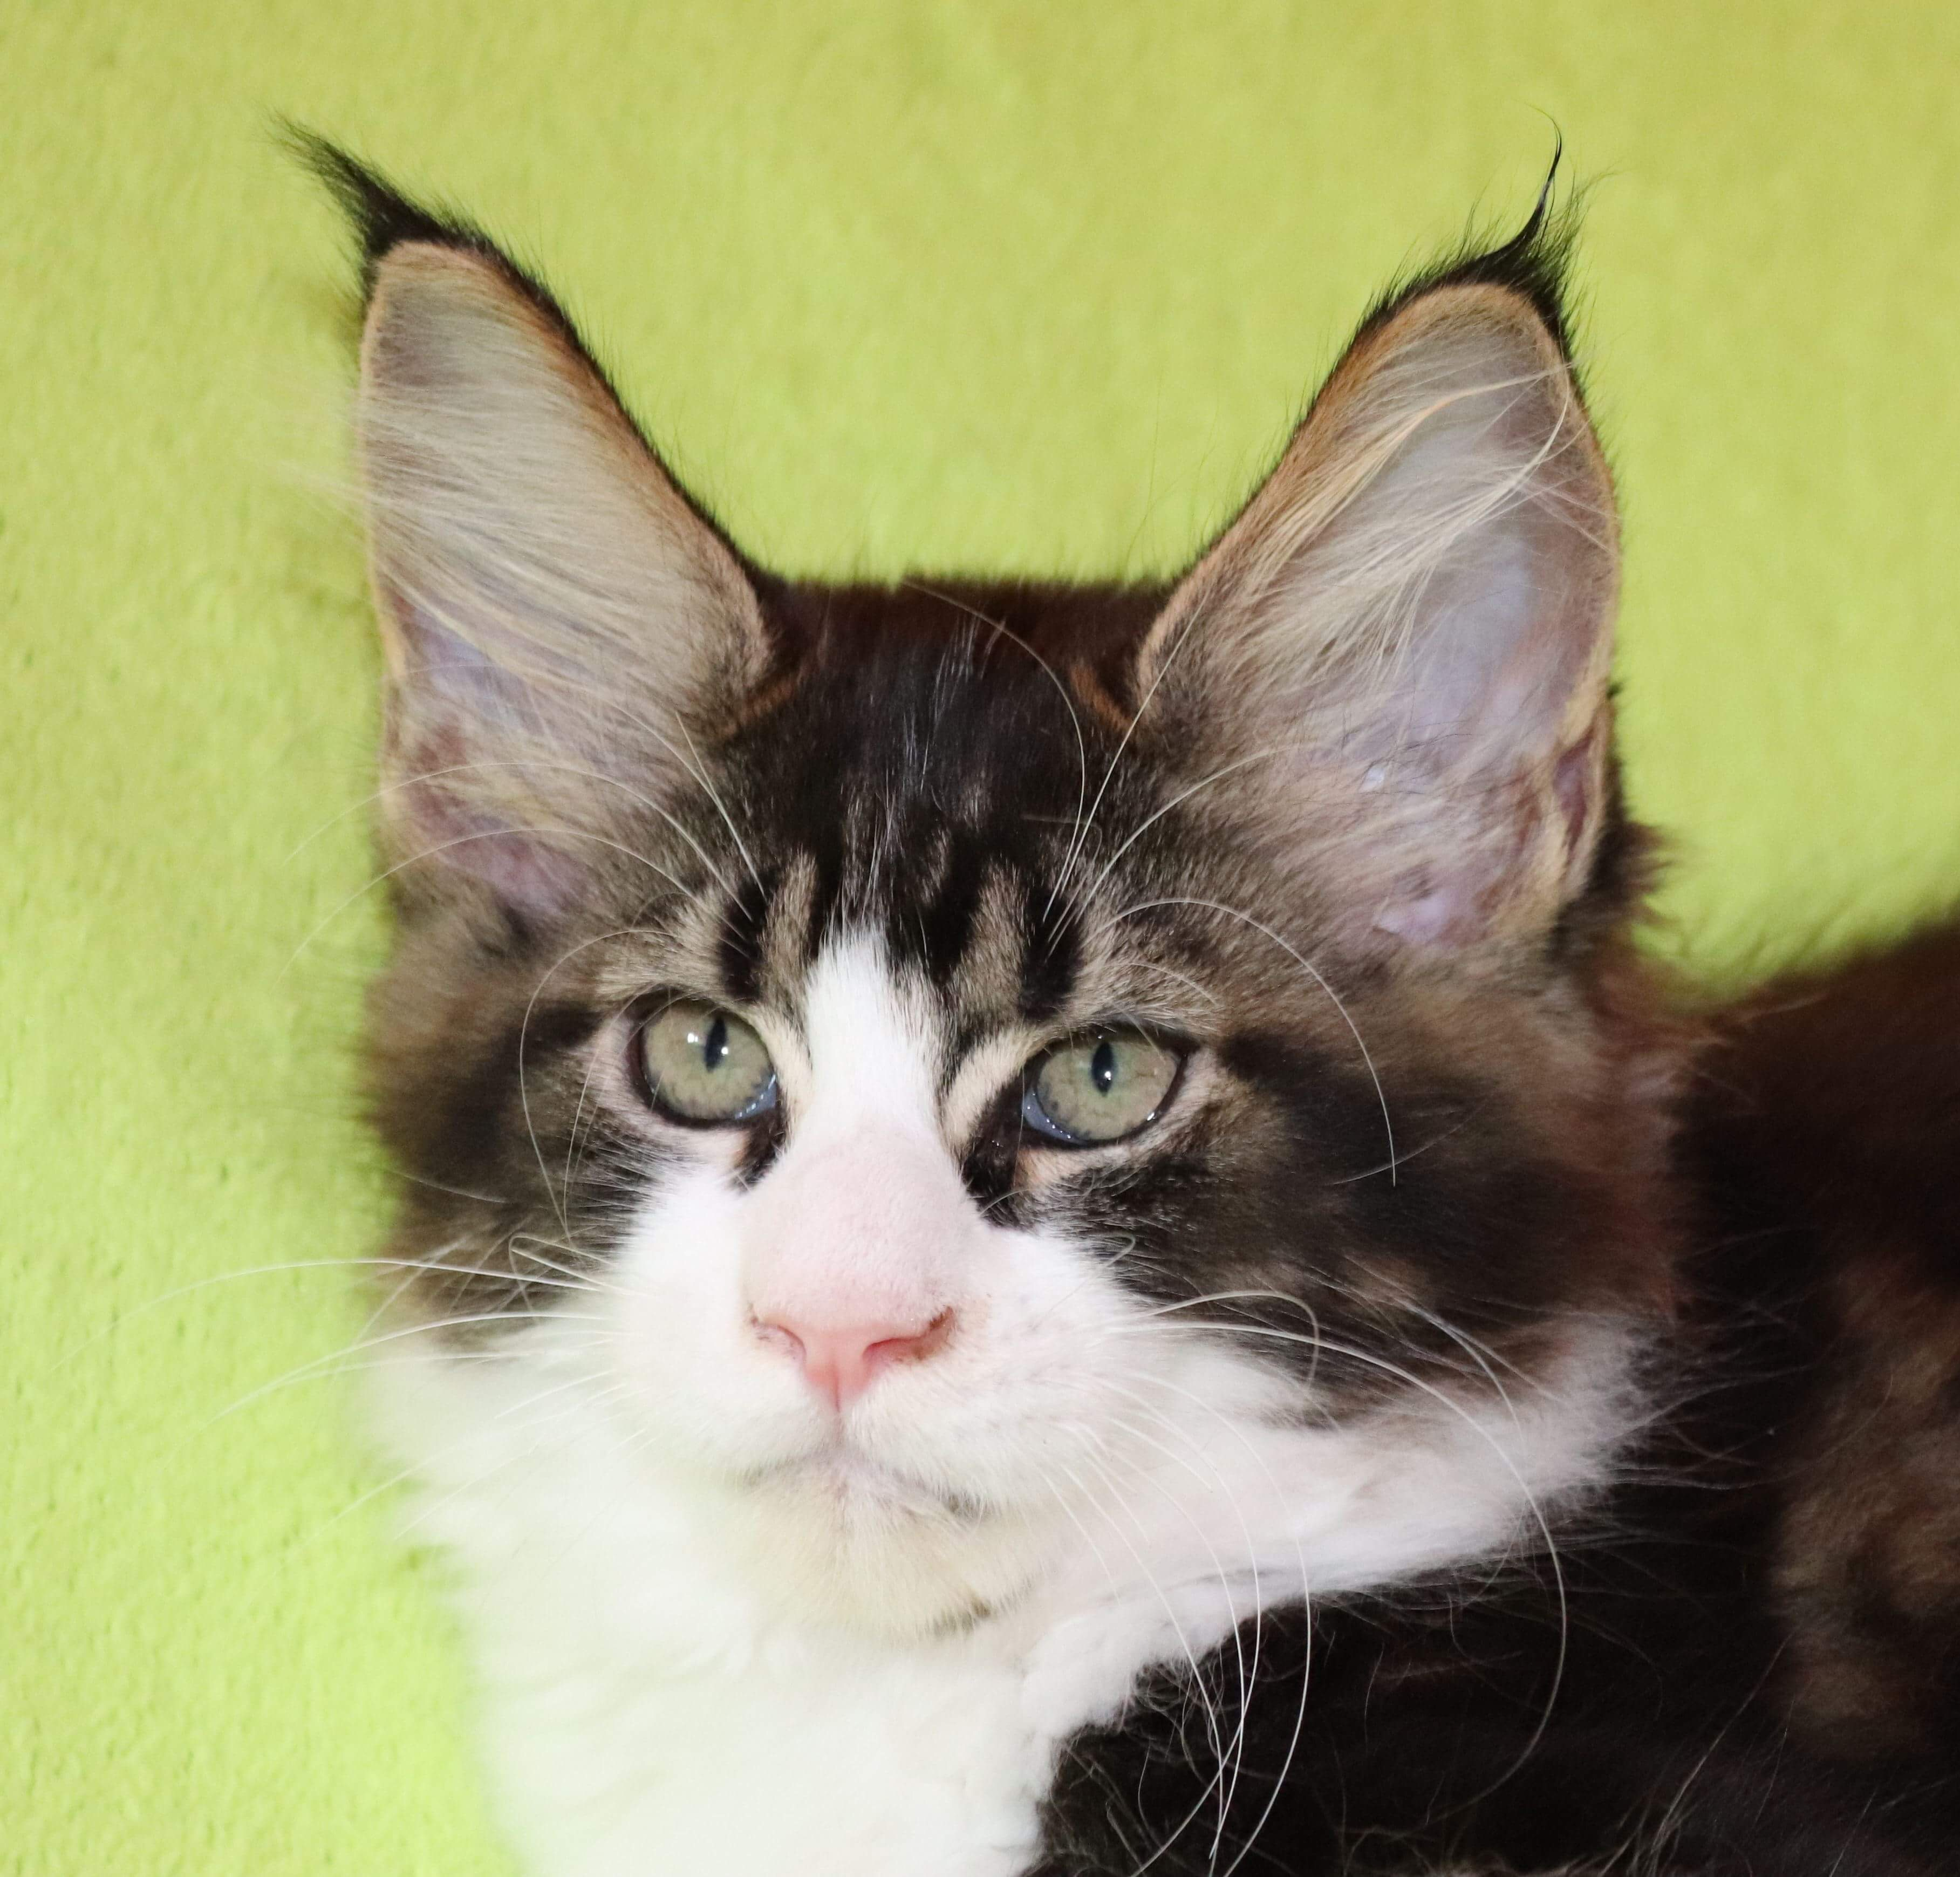 kočka VRH F: FRUGO von ERILLIAN*CZ 👦🏻